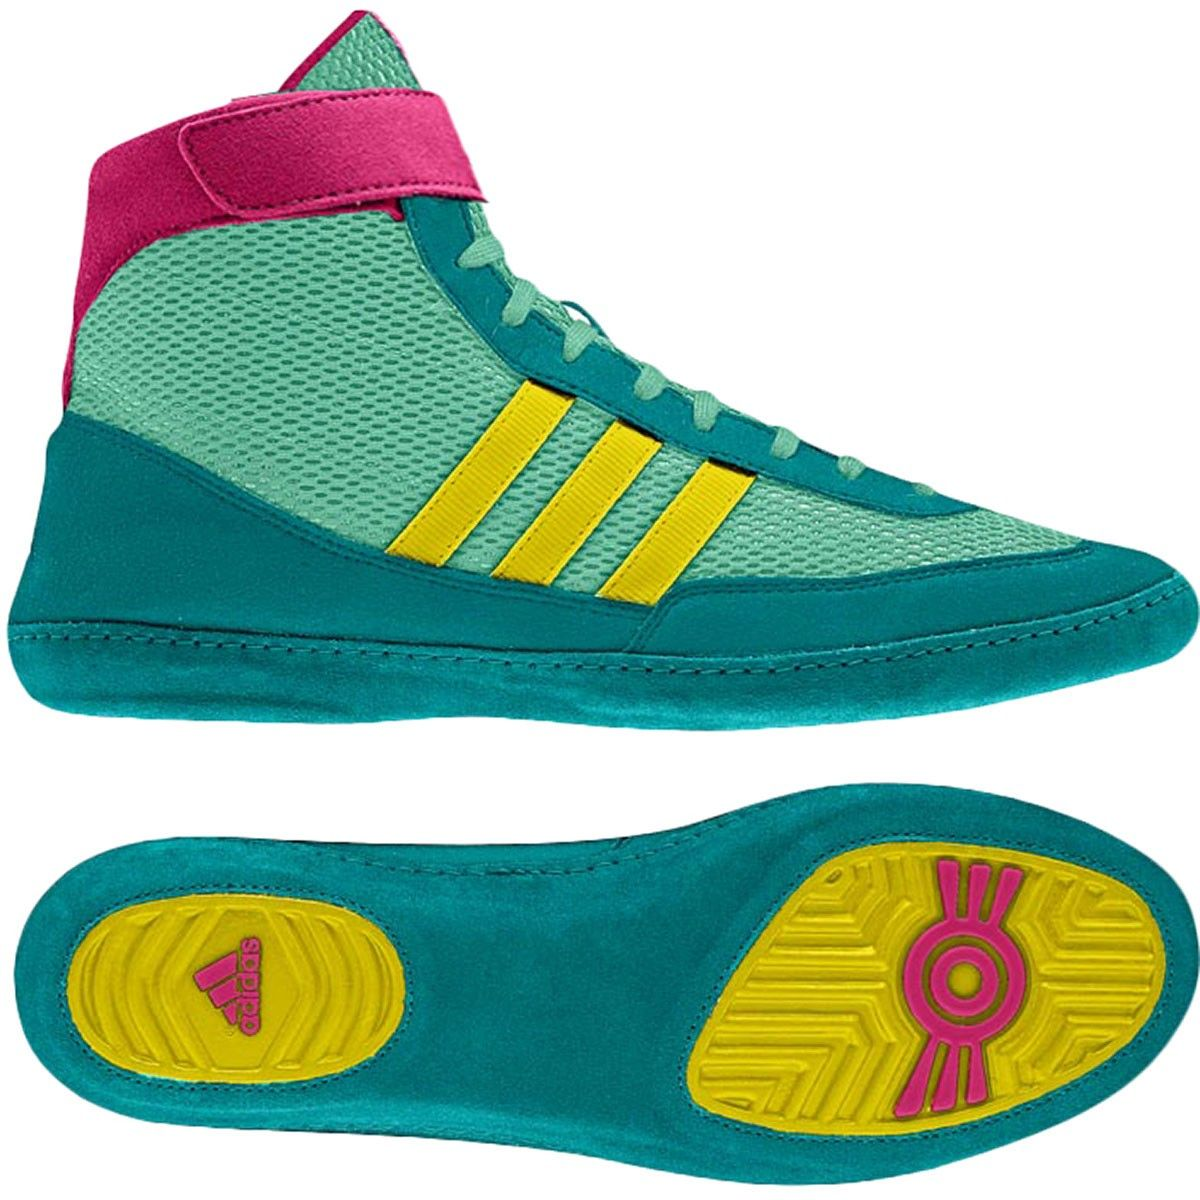 247f6c5052f9 adidas Combat Speed 4 Wrestling Shoes - Blast Emerald Vivid Yellow  Blast  Pink- size 7